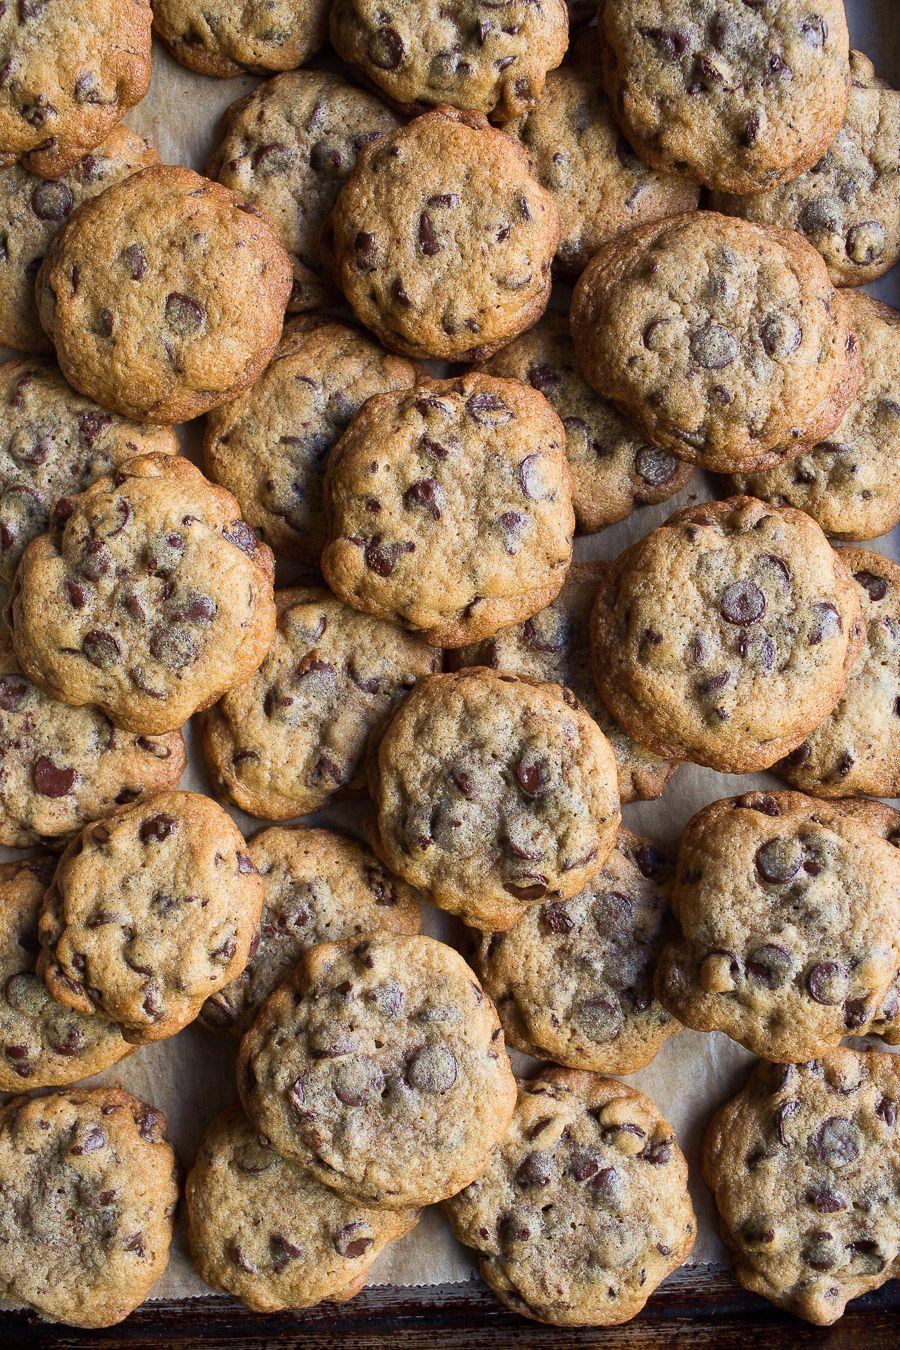 Chocolate Chip Cookies | Barefoot contessa, Ina garten and Garten